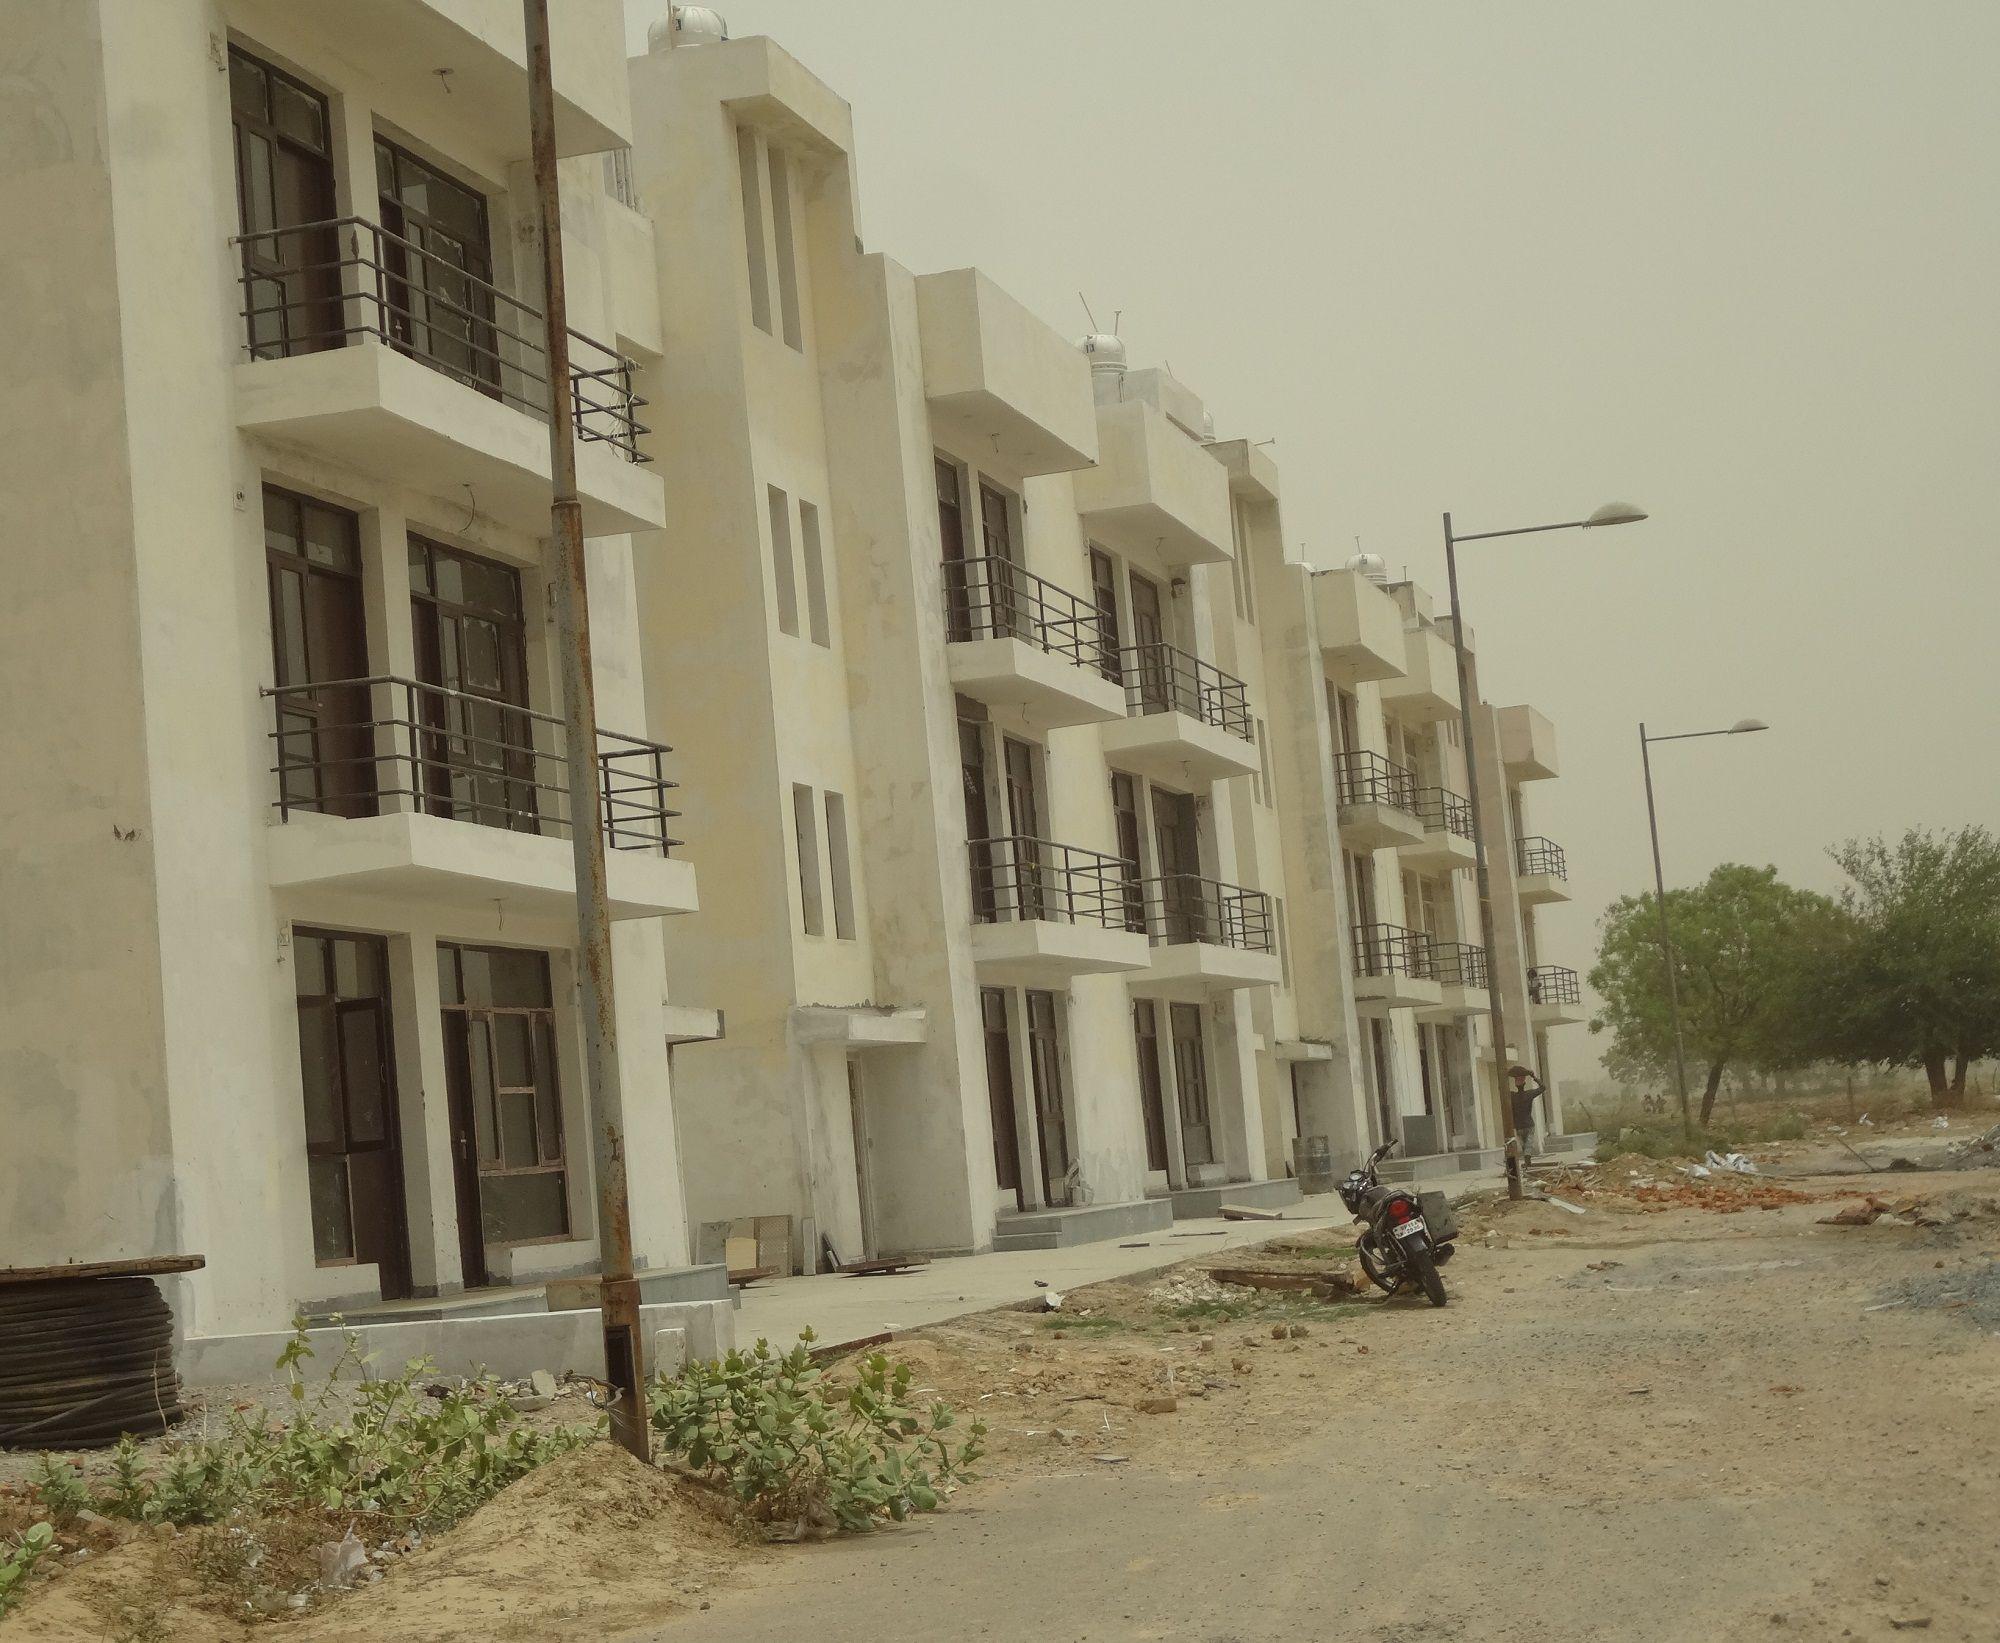 Villas In Greater Noida Amrapali The Hemisphere Villas 9266552222 Noida Free Classifieds In India Classified Ads On Hemisphere Greater Noida Online Ads